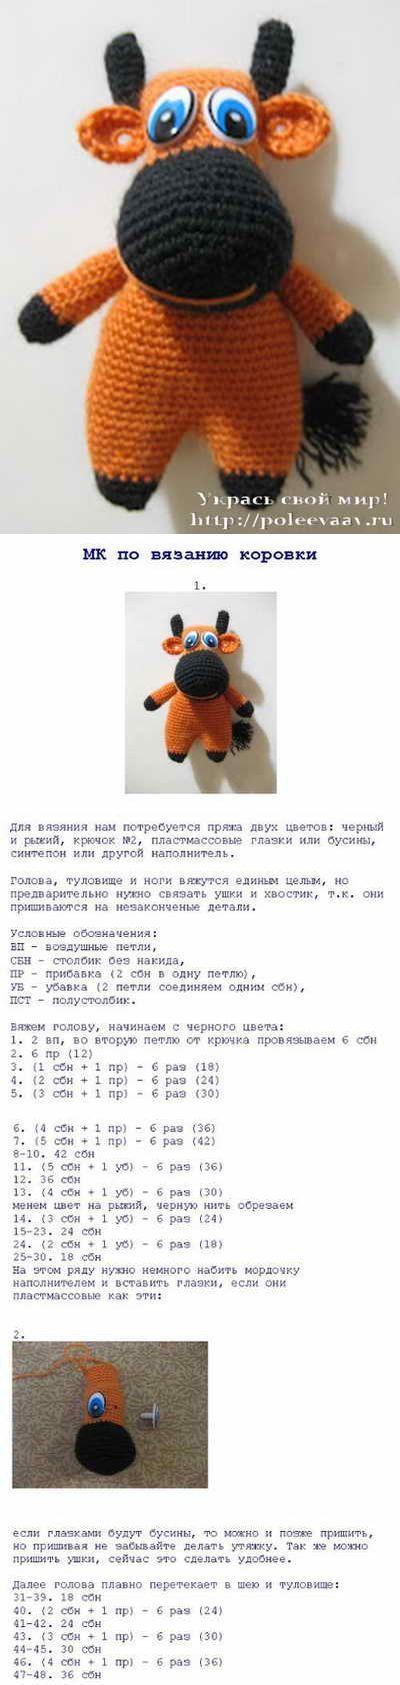 poleevaav.ru